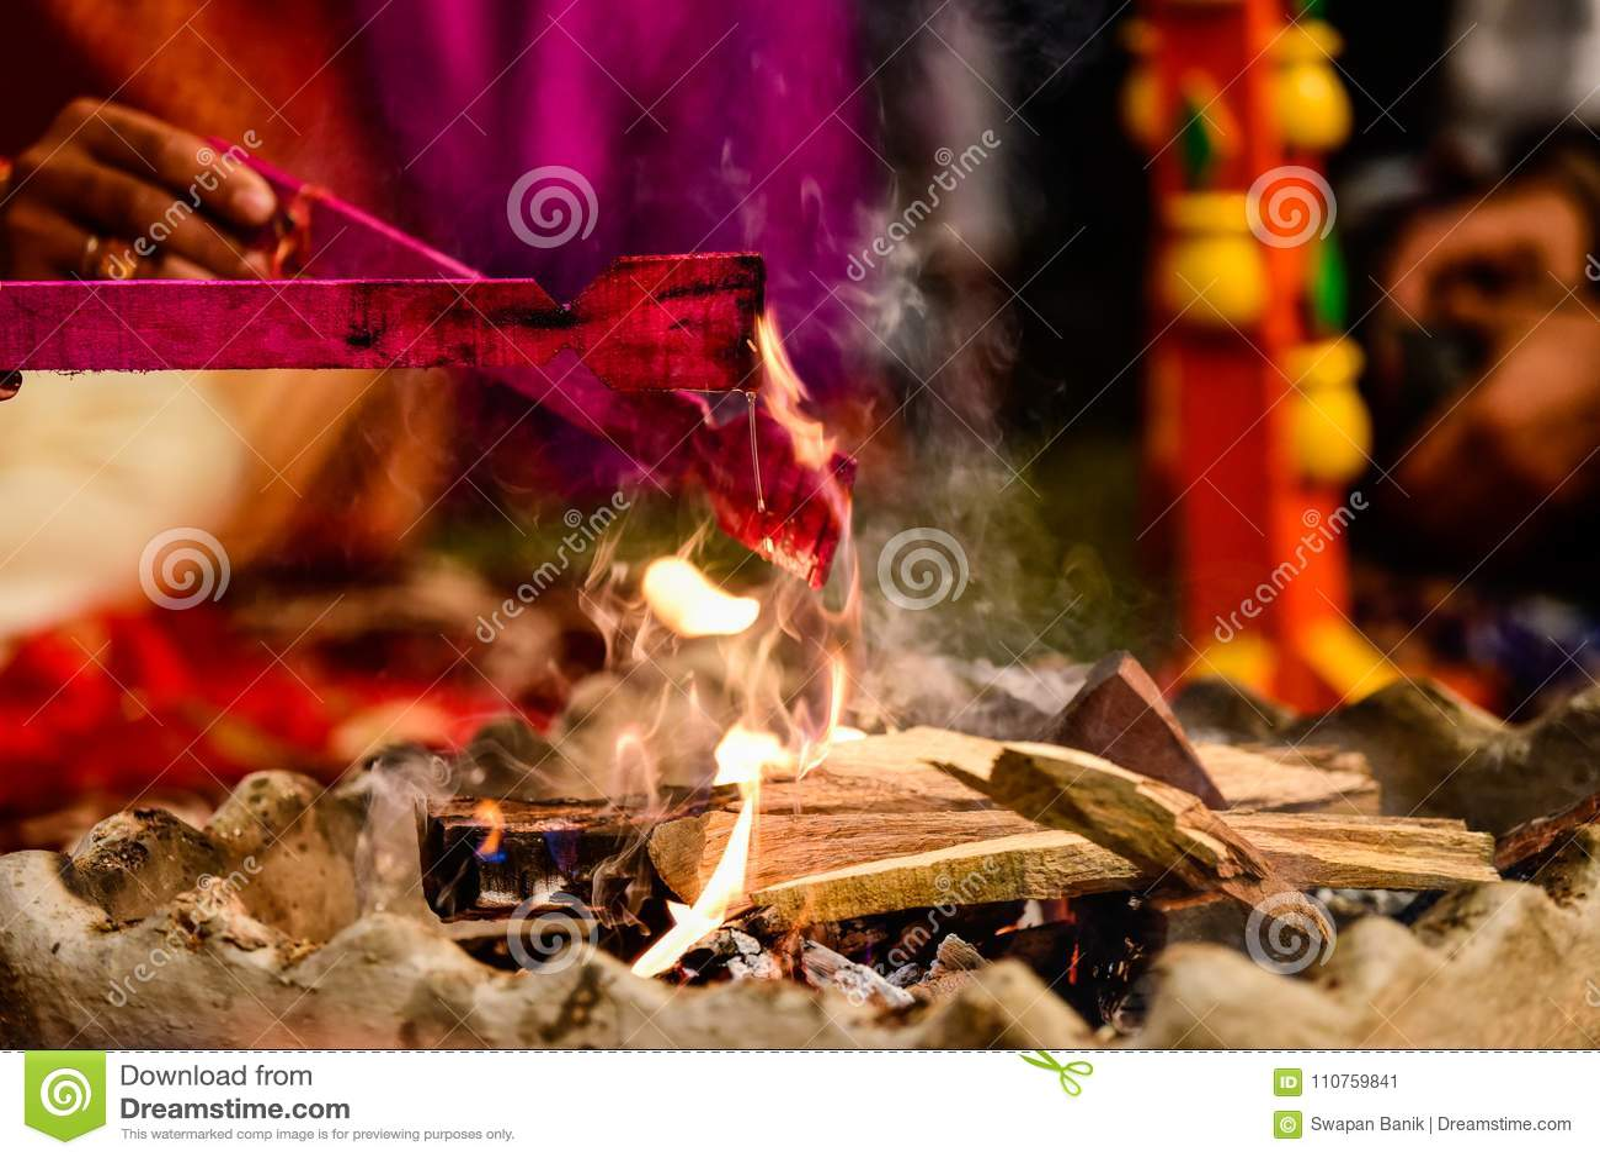 Yagya um ritual no hinduism